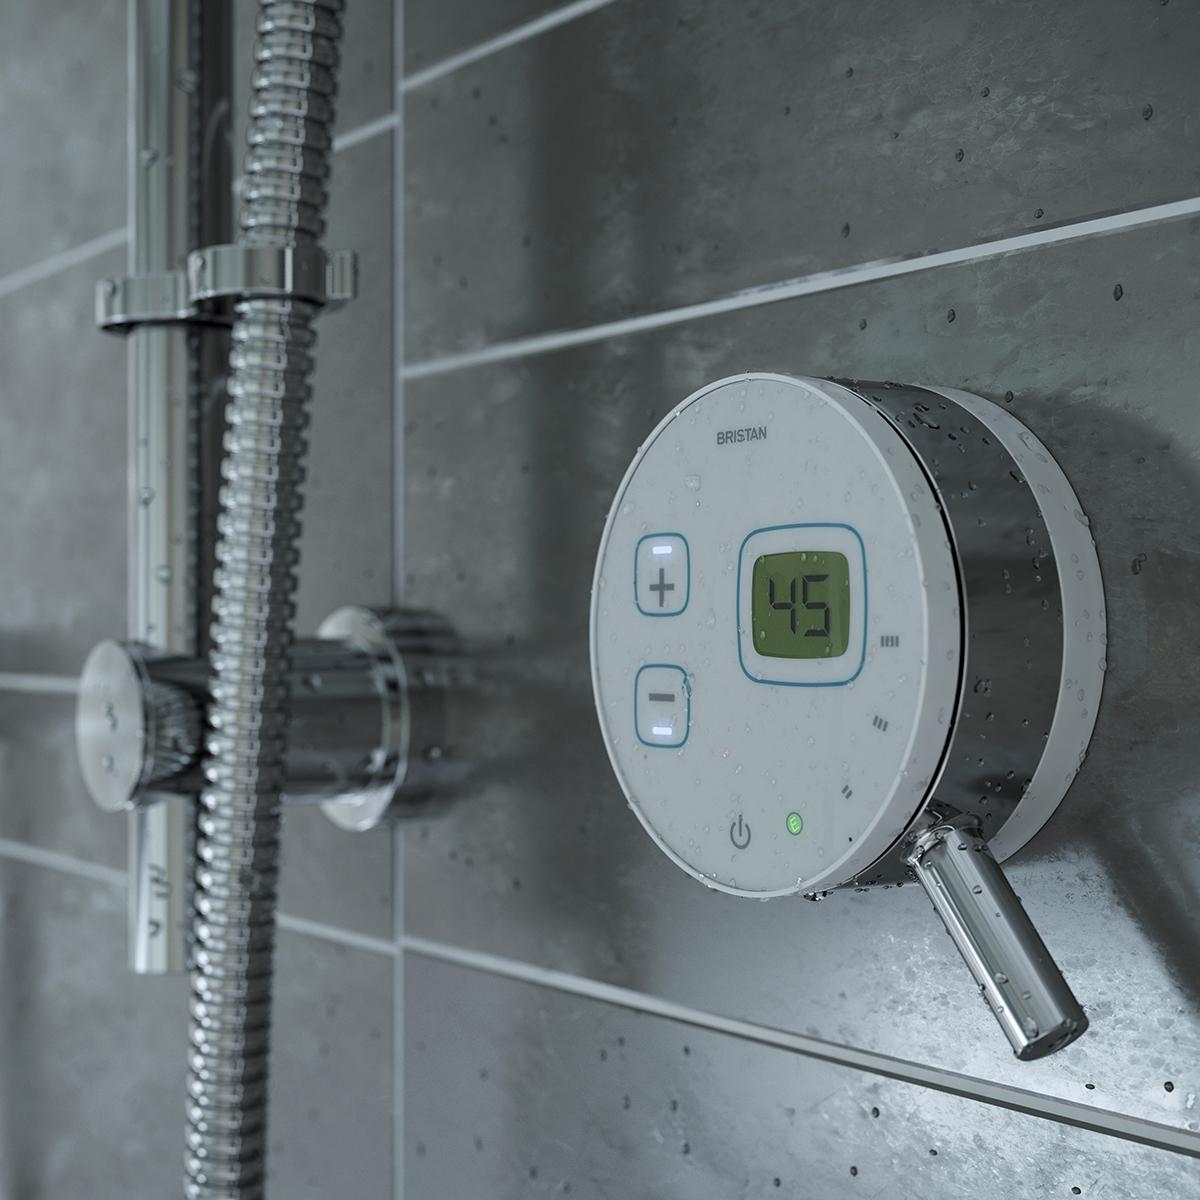 Bristan Artisan Evo Digital Mixer Shower with Shower Kit - White/Chrome-0